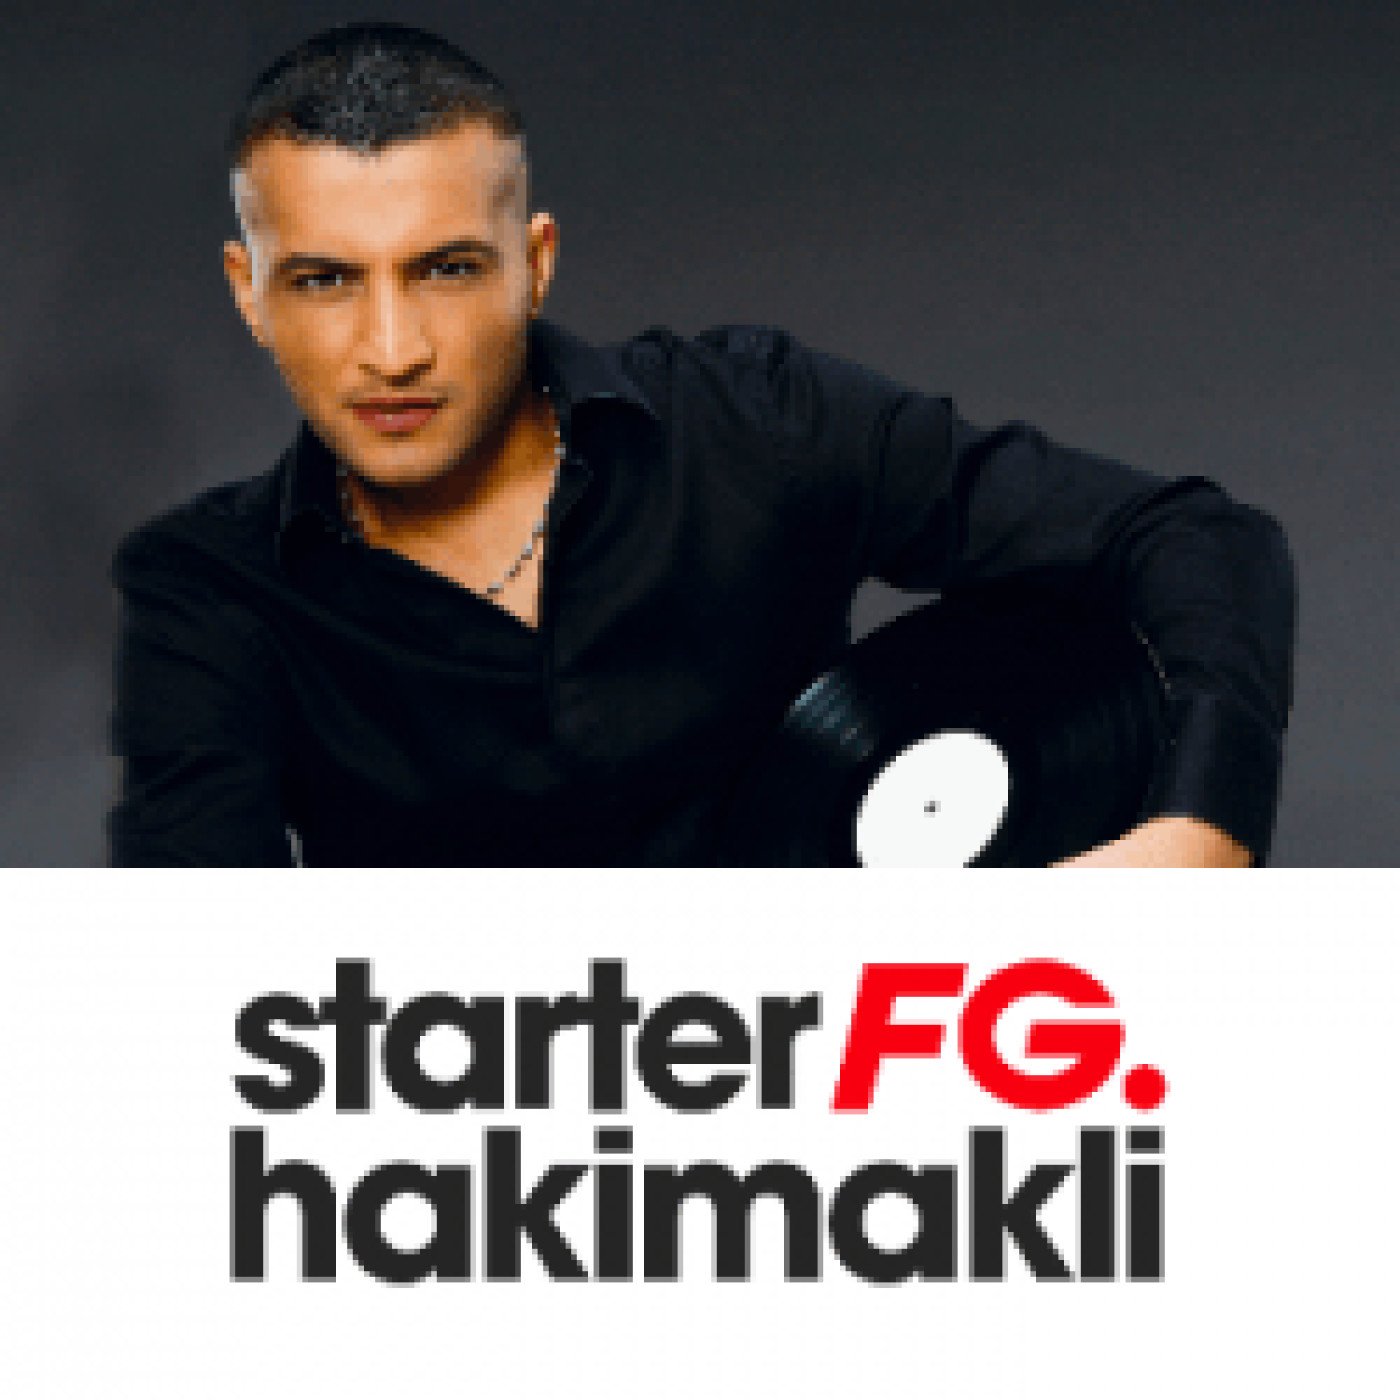 STARTER FG BY HAKIMAKLI MERCREDI 2 DECEMBRE 2020